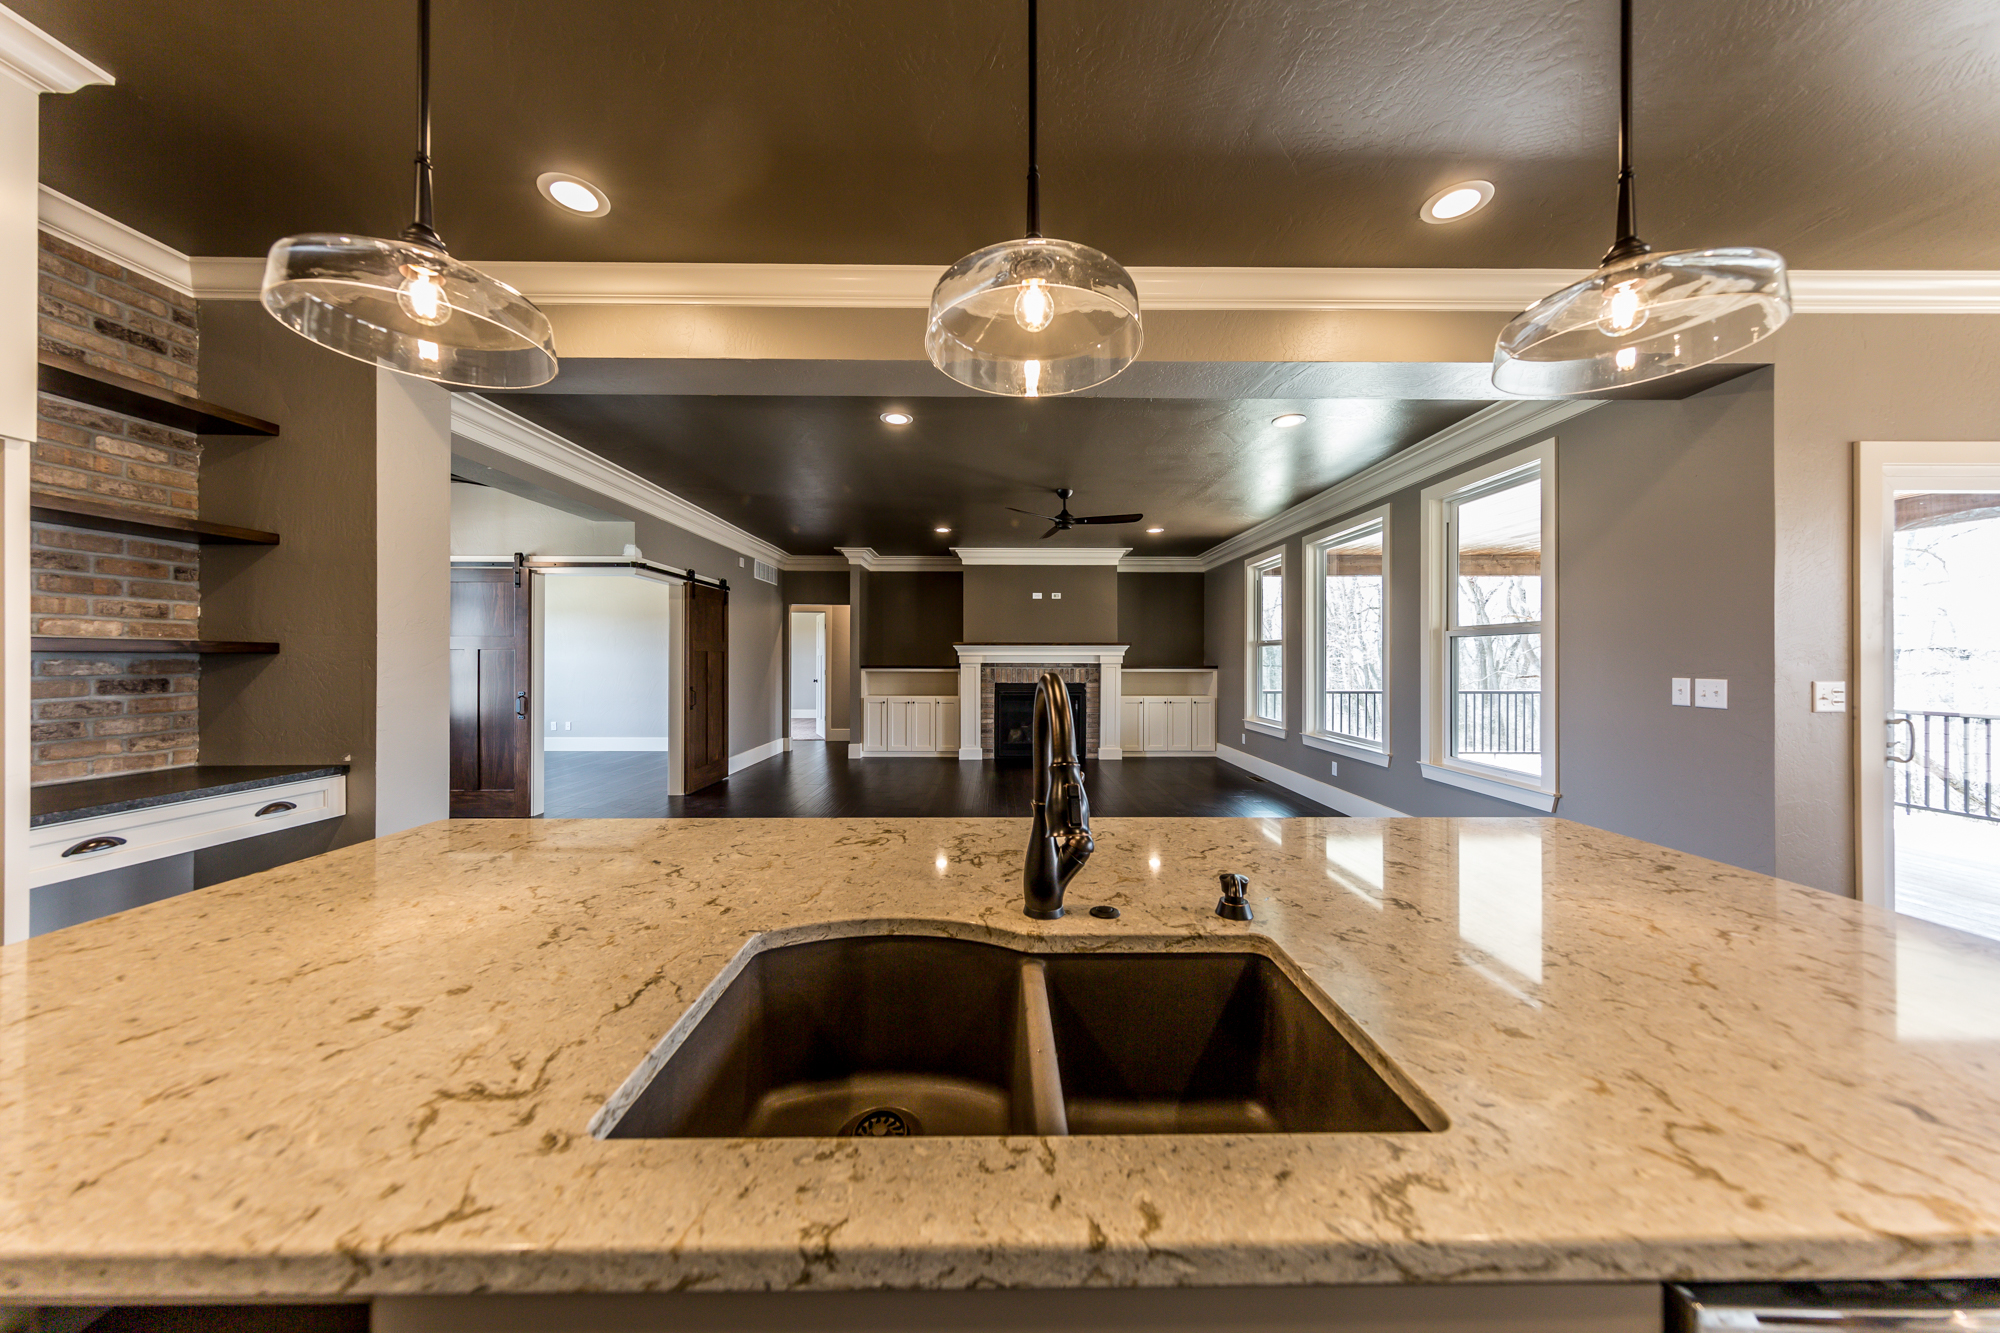 New-Construction-For-Sale-Bethel-Ridge-Farms-Scott-AFB-Illinois-12.jpg